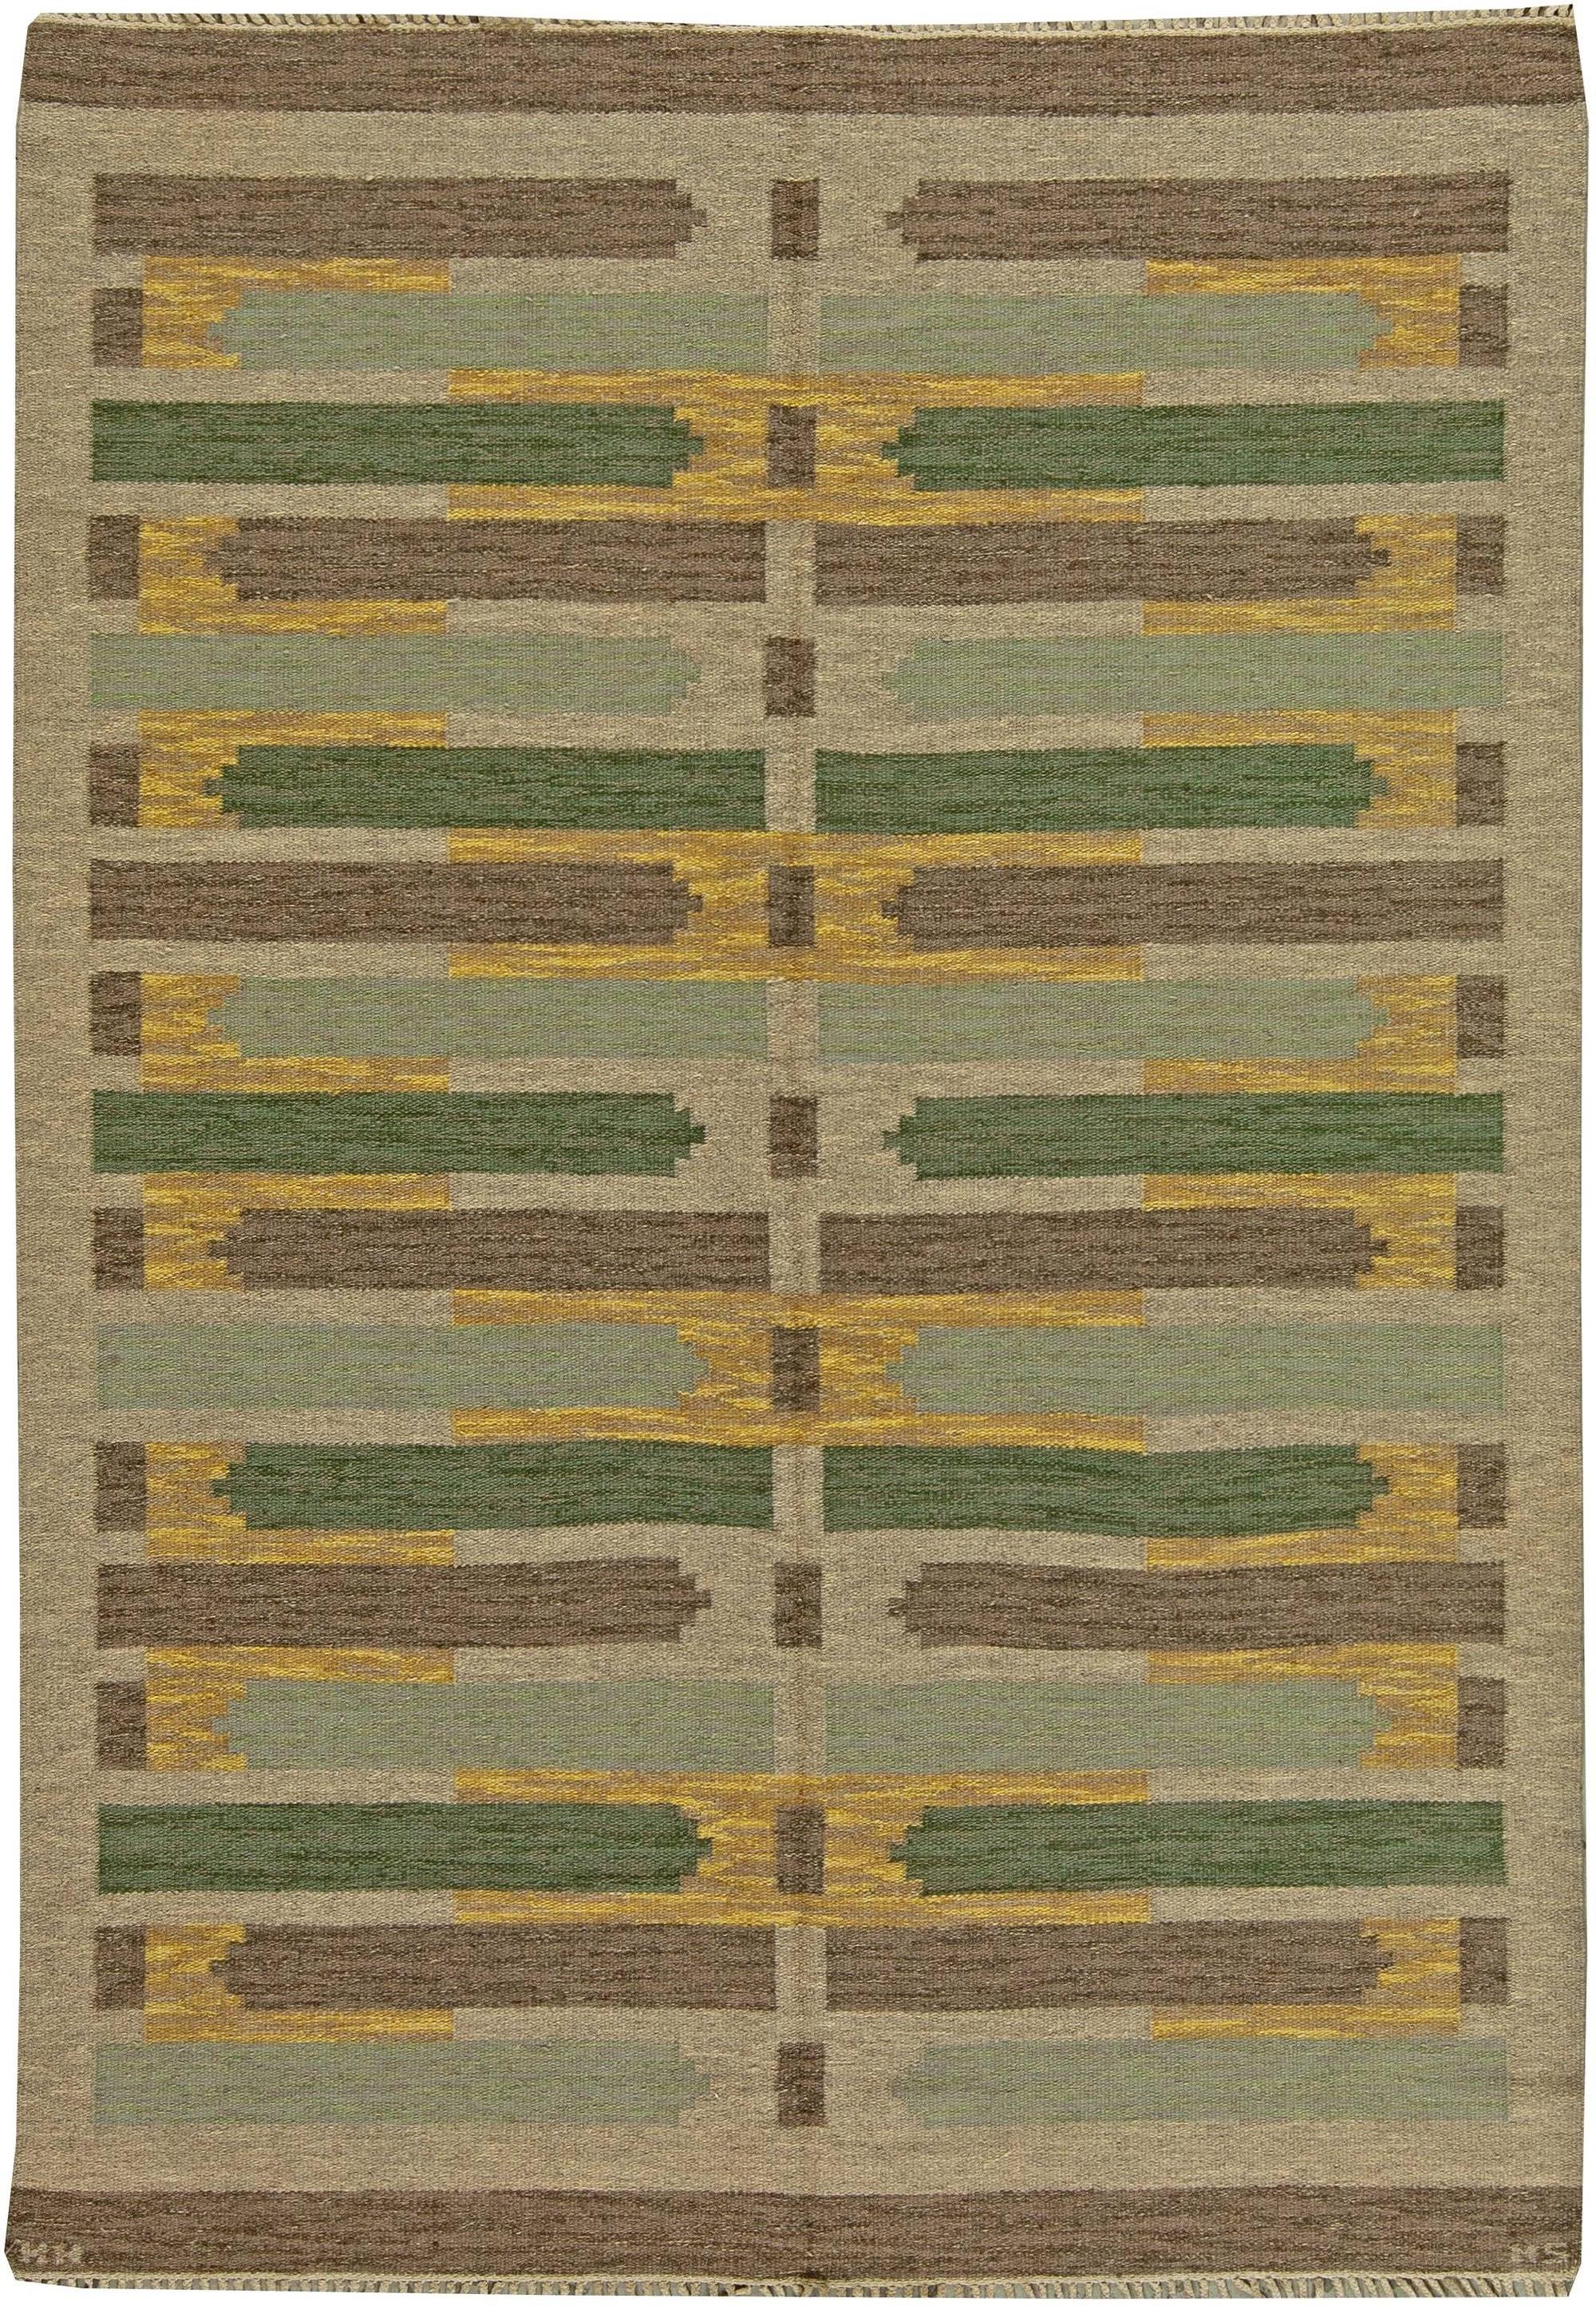 Vintage swedish flat weave Rug by Maj Swanstrom BB5955